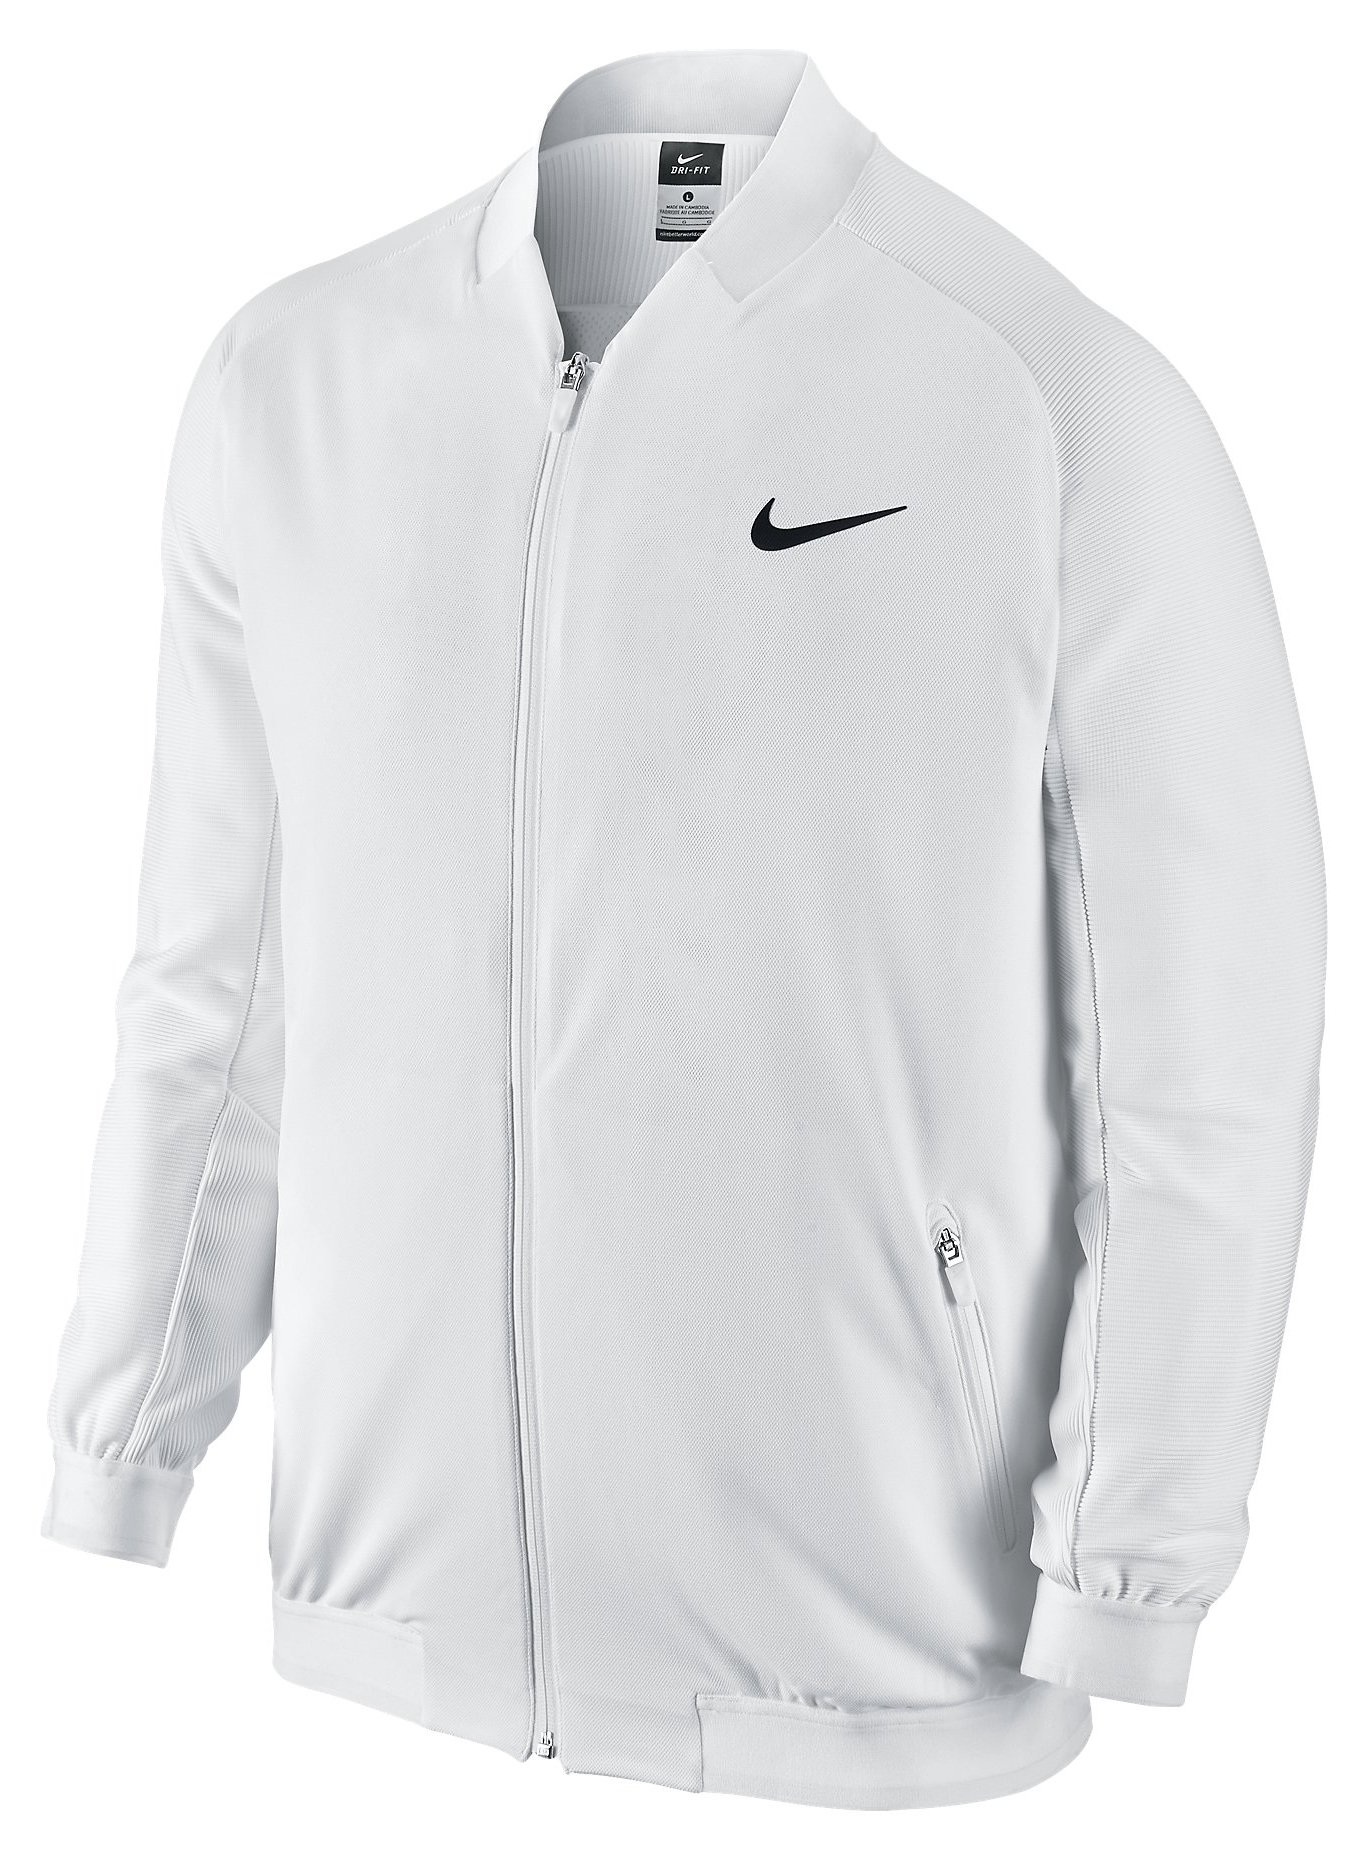 Bunda Nike PREMIER JACKET